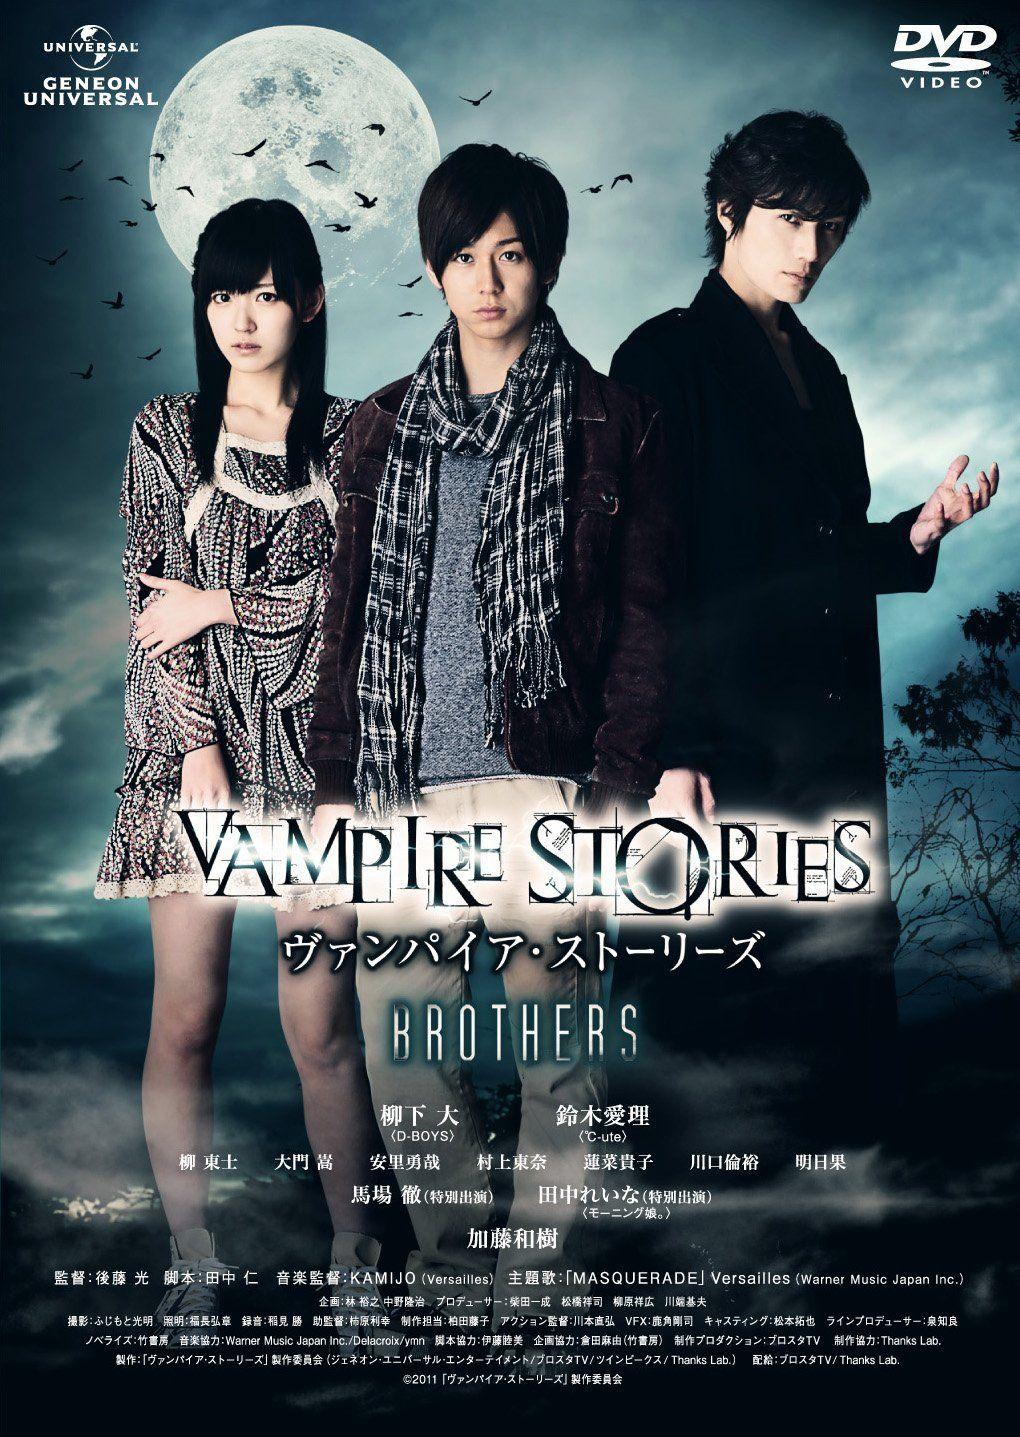 Vampire stories brothers subtitle indonesia